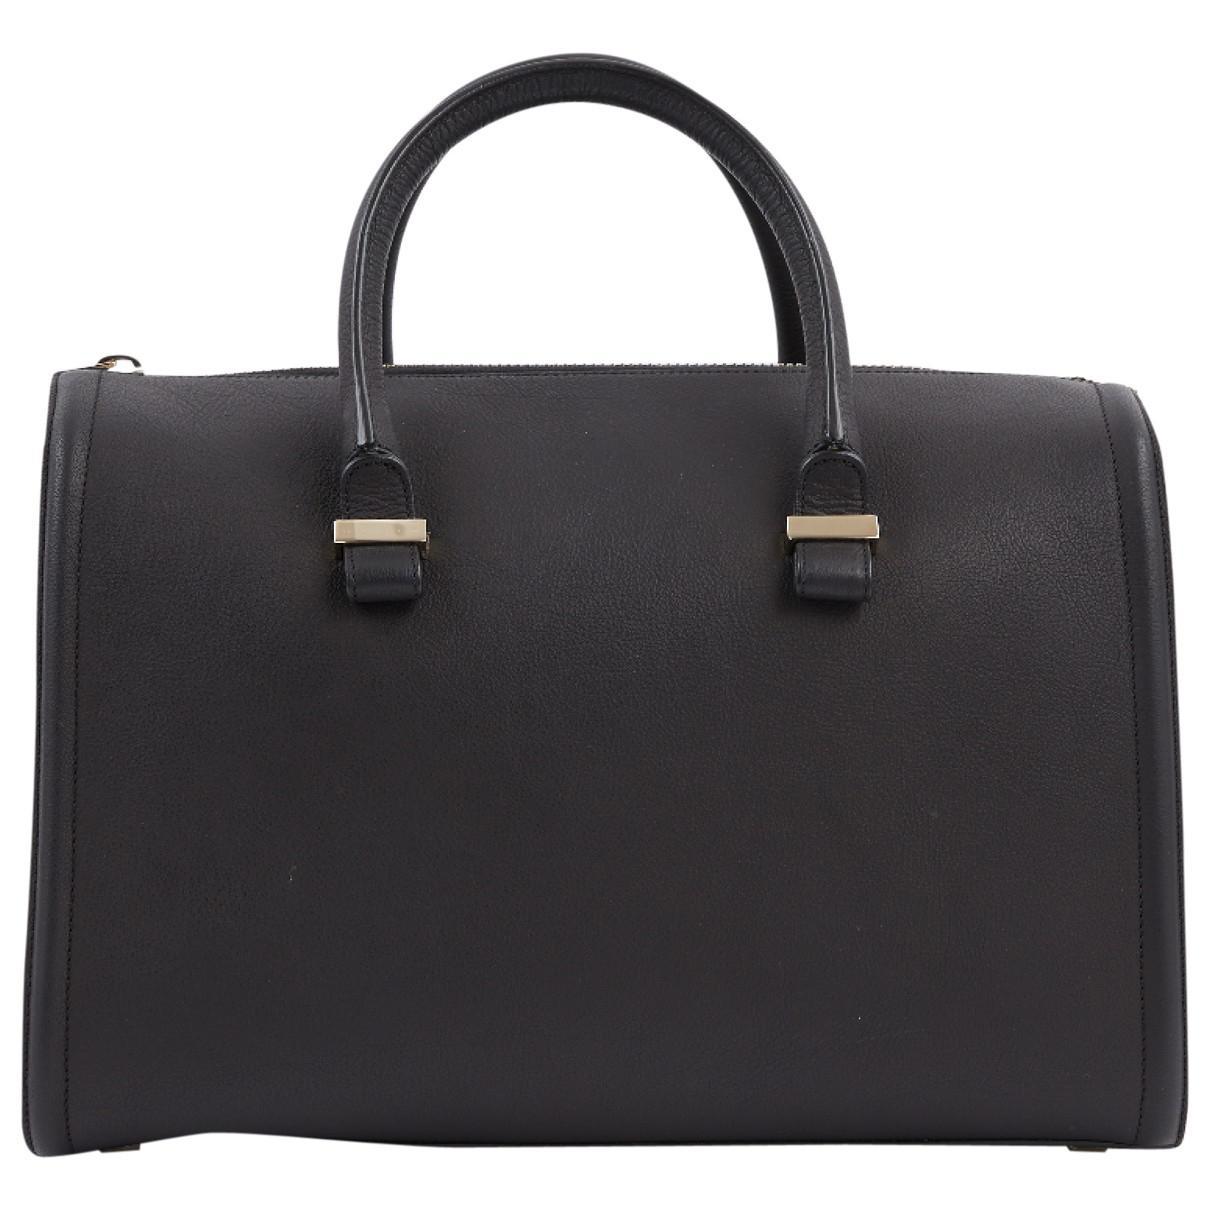 Victoria Beckham Pre-owned - Leather mini bag Vd3D7Z